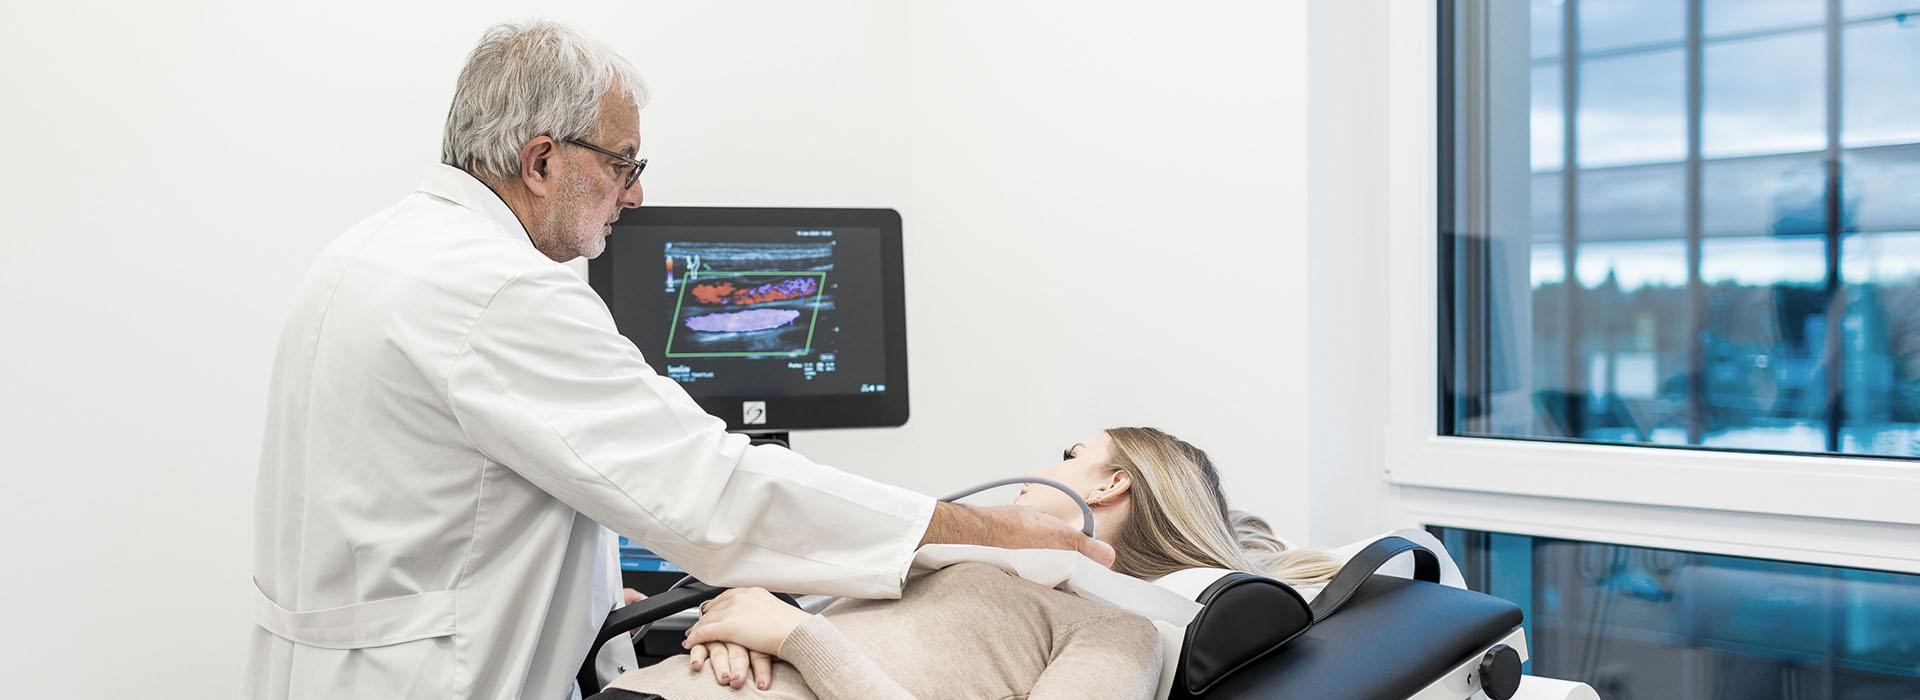 Gefaessklinik_Tsantilas_Augsburg_Diagnose